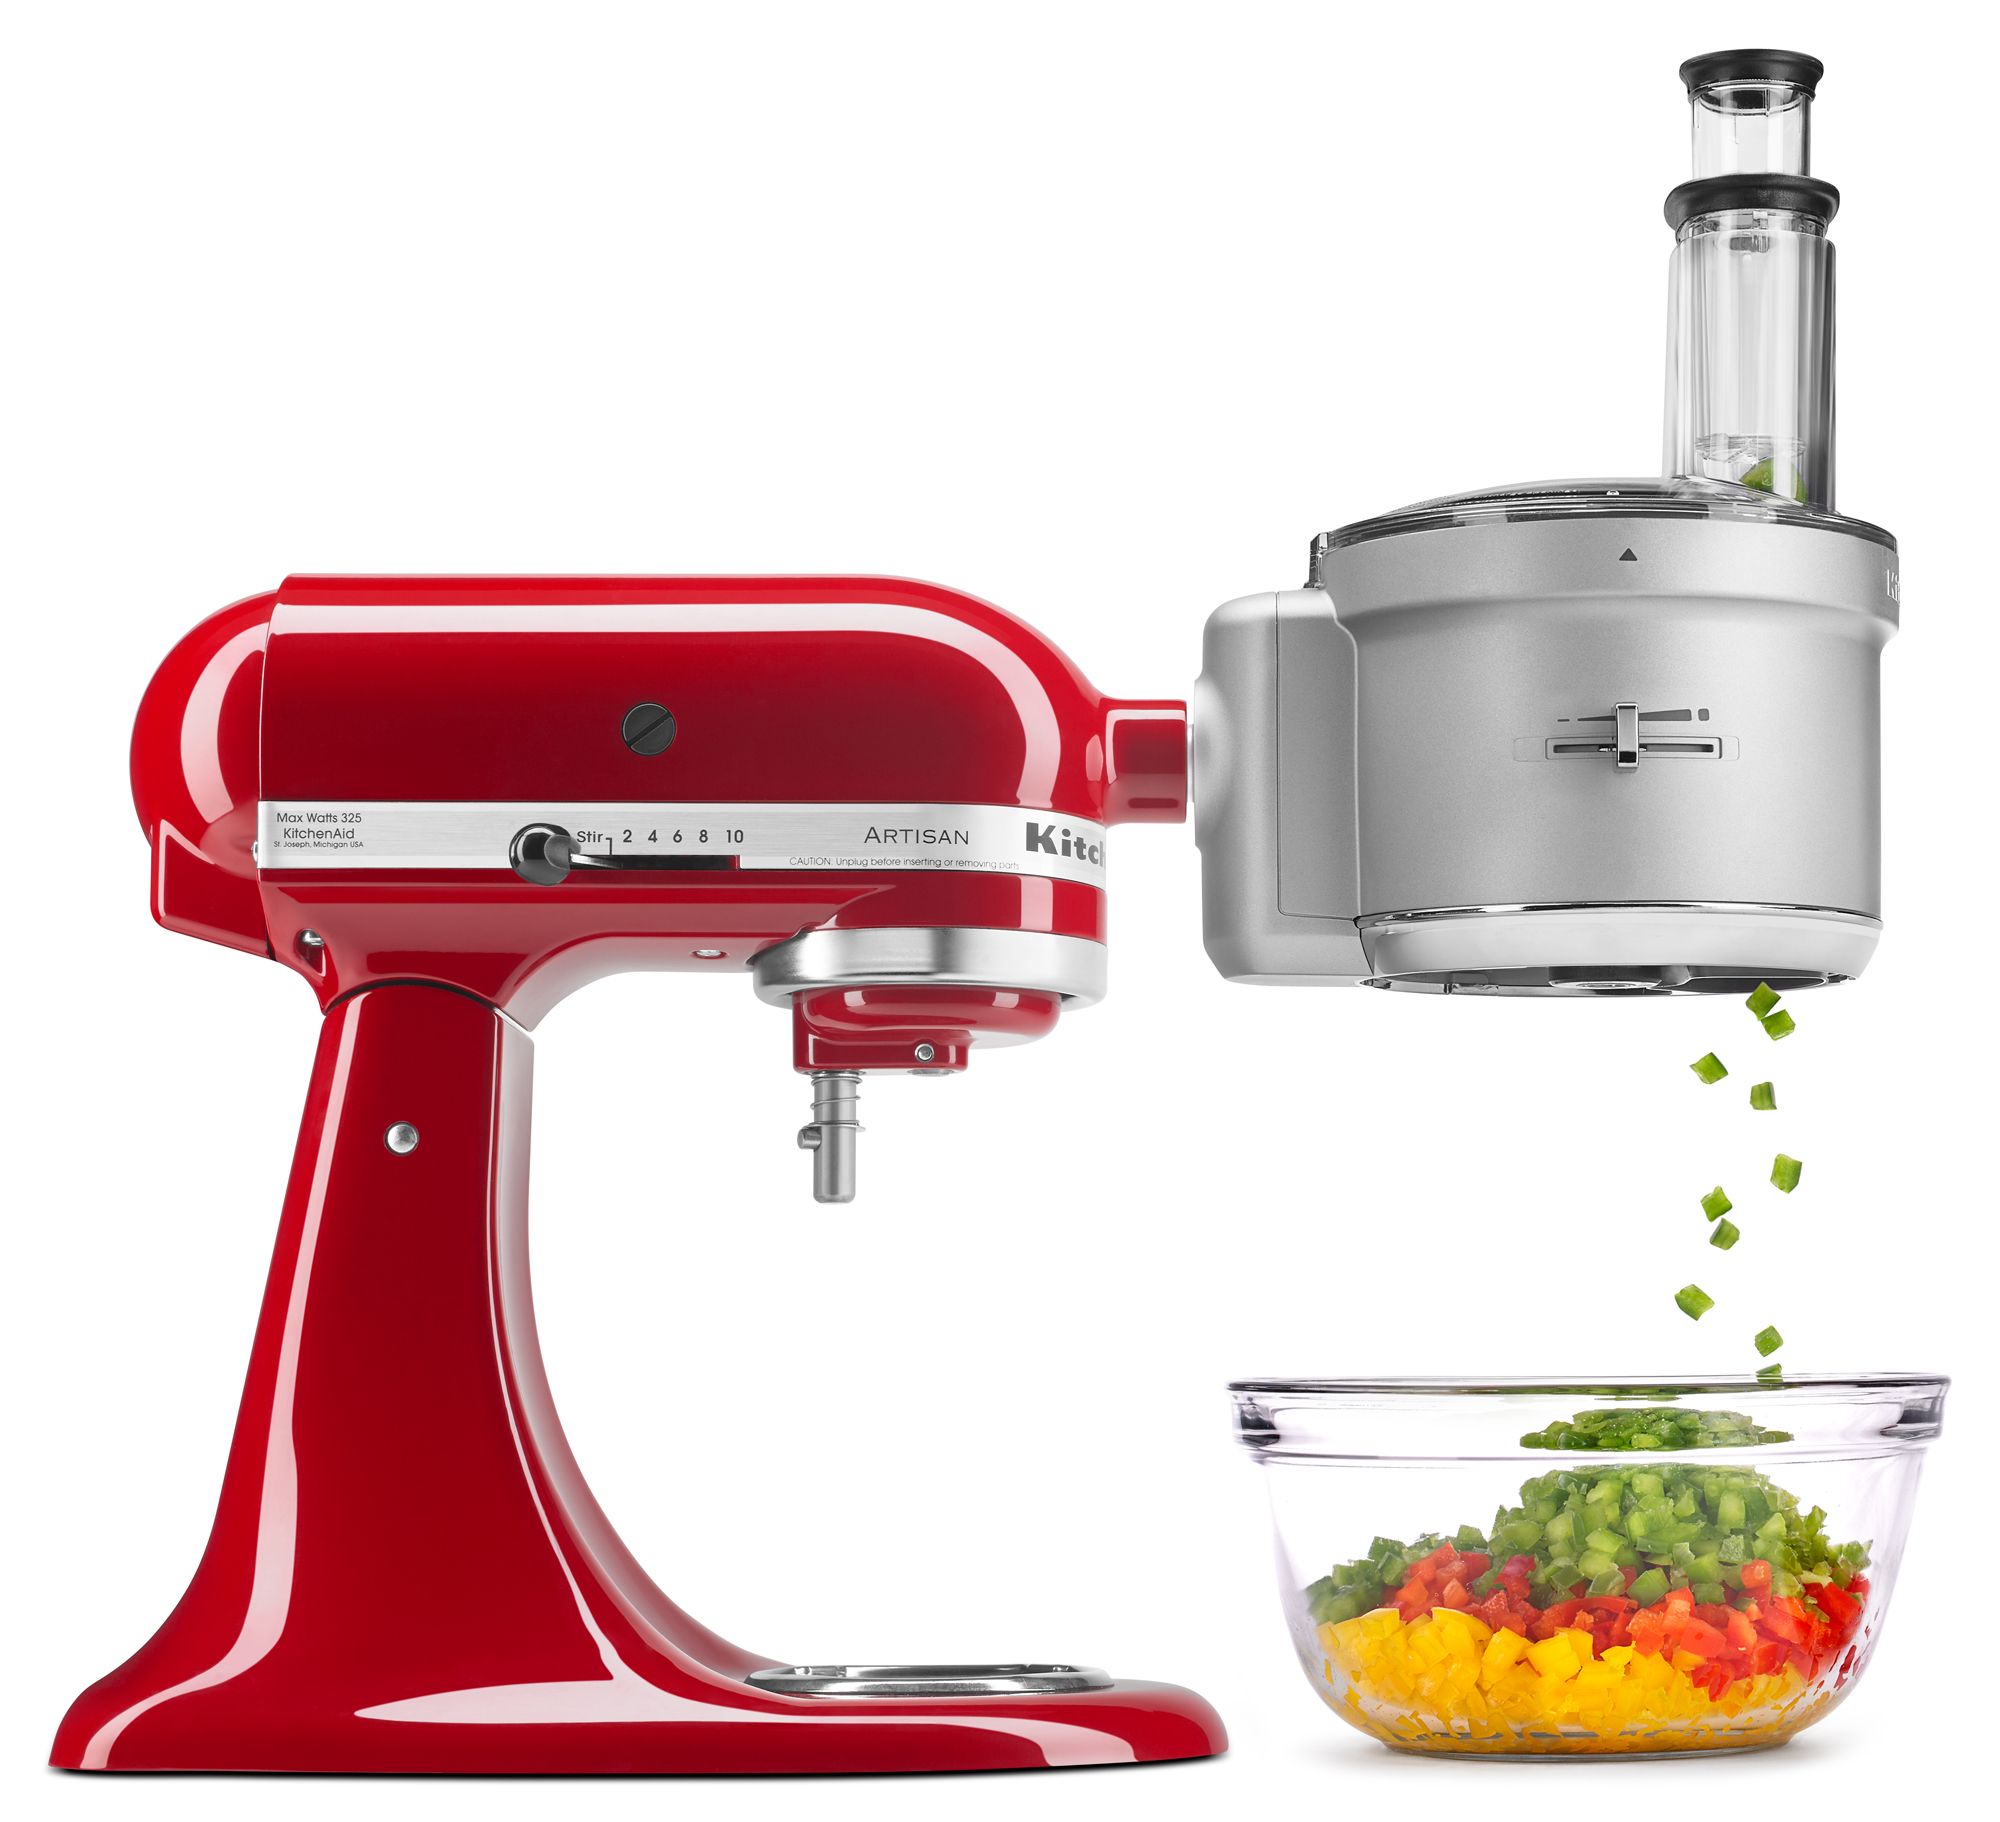 Spiralizer Attachment For Food Processor